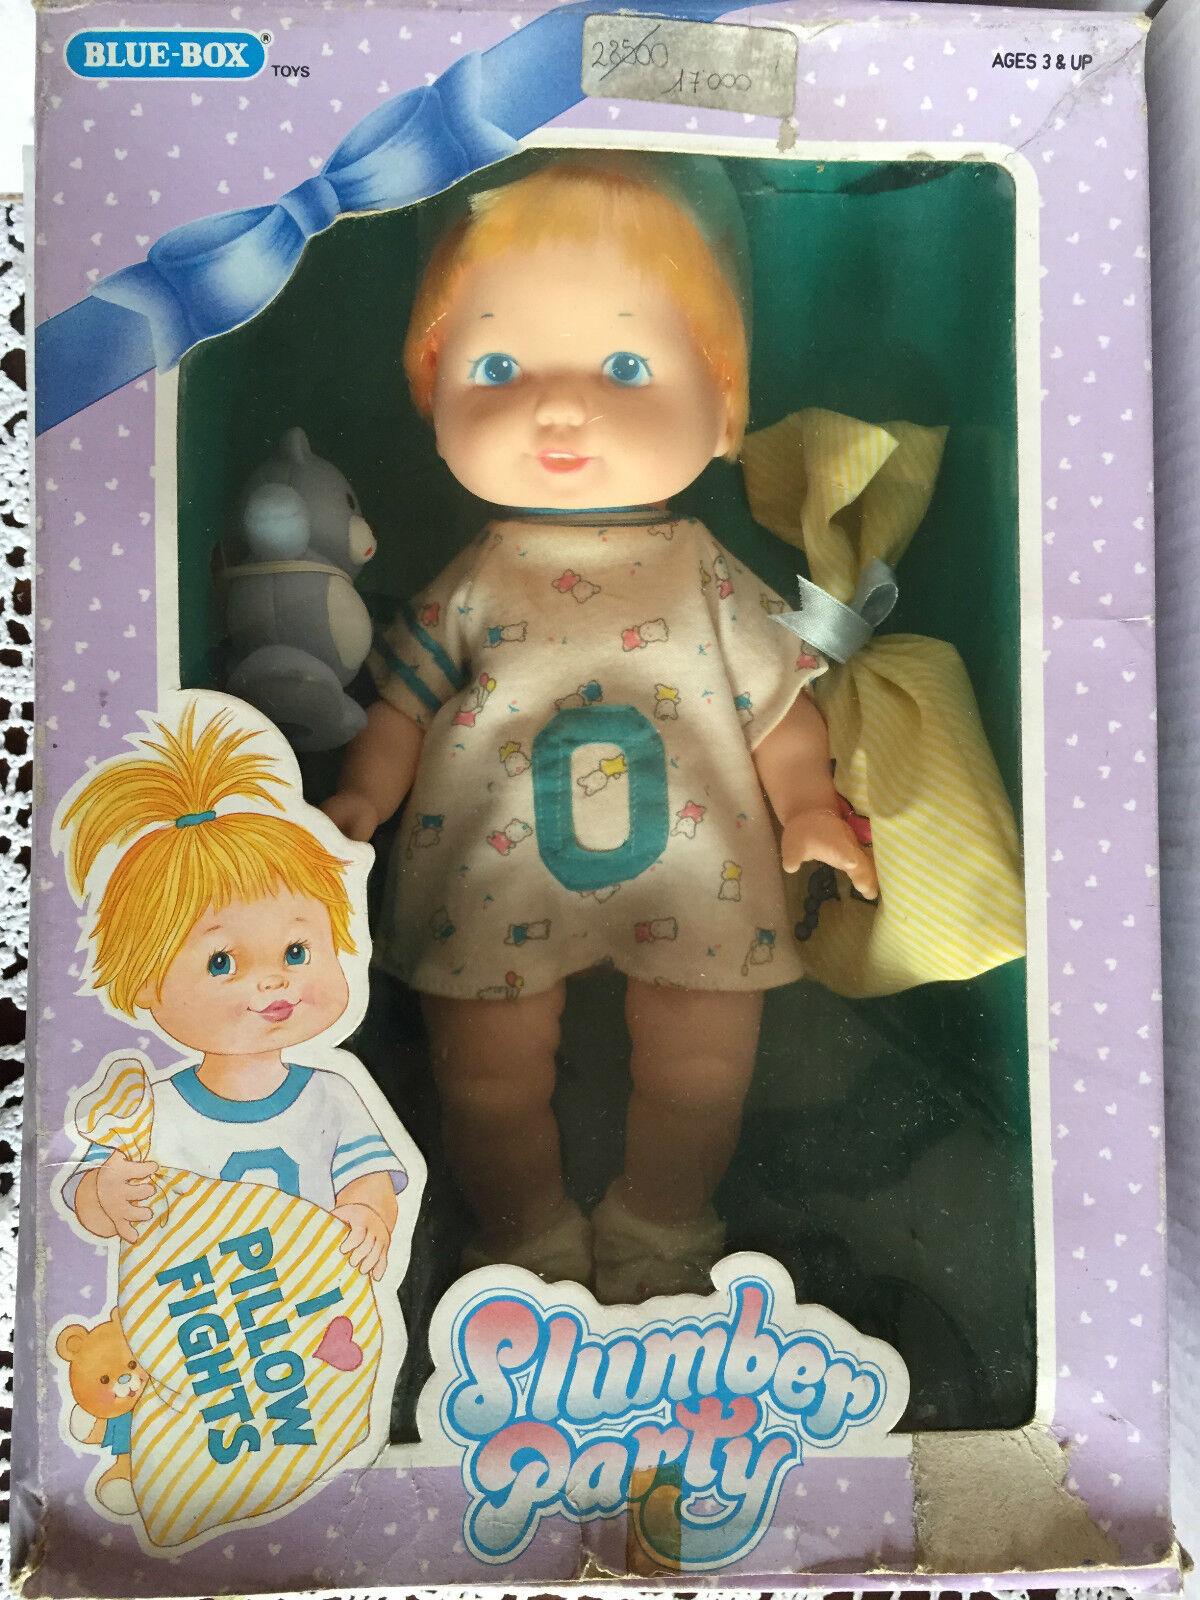 SLUMBER PARTY Blau Blau Blau BOX BAMBOLOTTO VINTAGE NEW 55a4a1